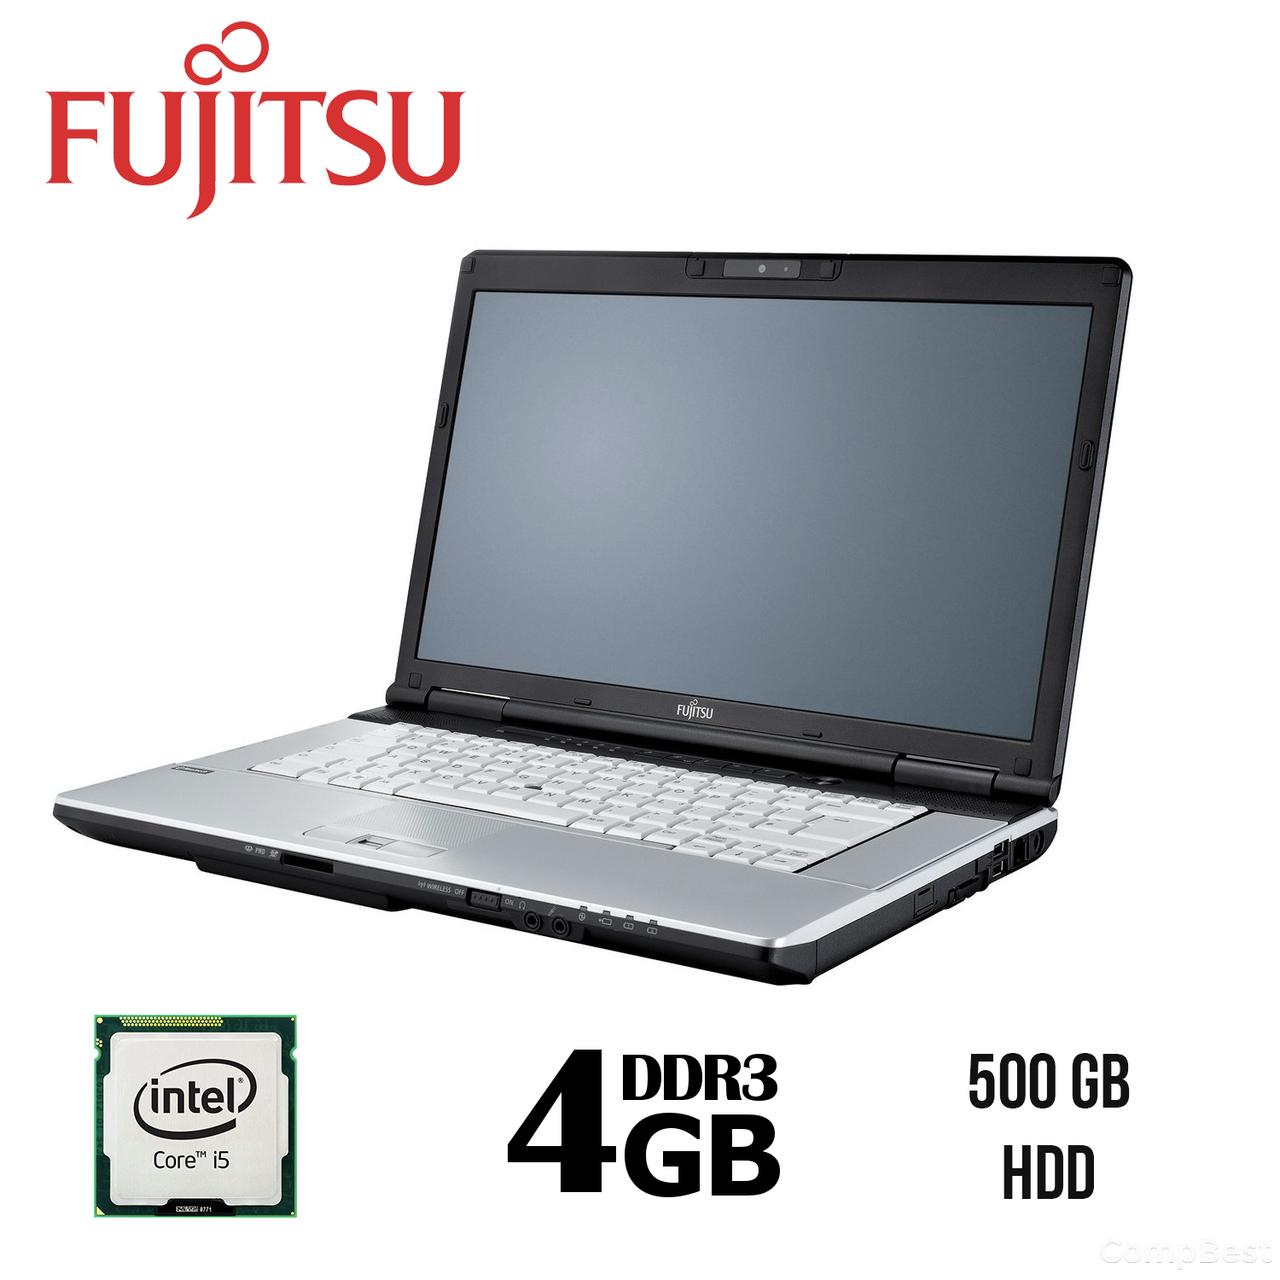 Fujitsu-Siemens Lifebook E751 / 15,6'' / Intel® Core™ i5-2520M (2(4) ядра по 2.5 - 3.2 GHz) / 4 ГБ DDR3 / HDD 500 ГБ / Intel HD Graphics 3000 /